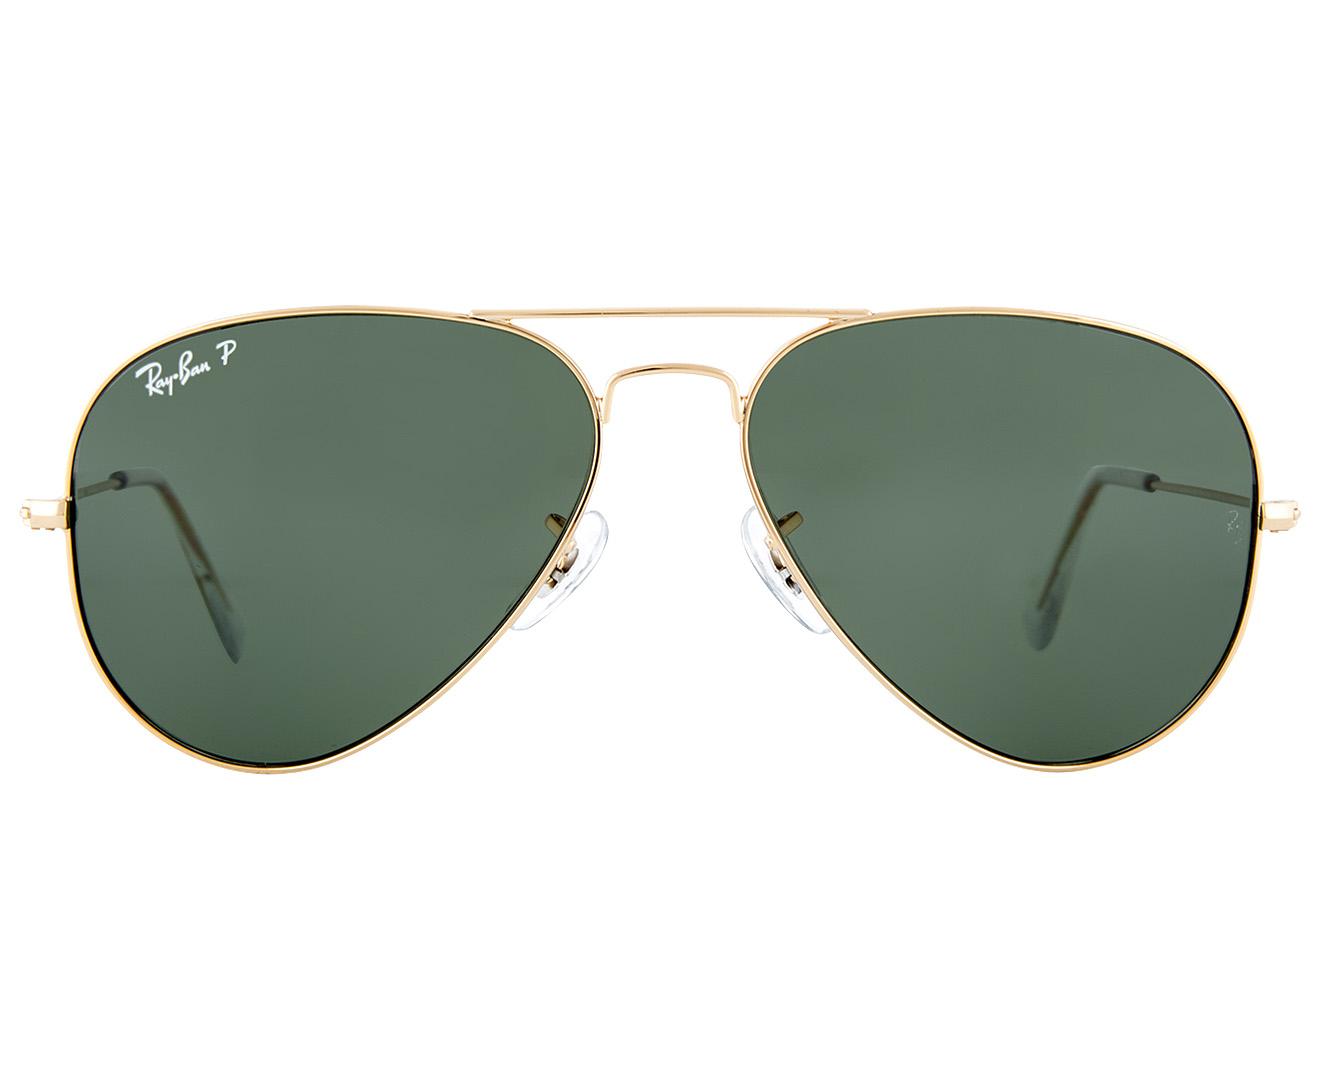 1c7fb385d553 Aviator Ray Ban Sunglasses Ebay Australia